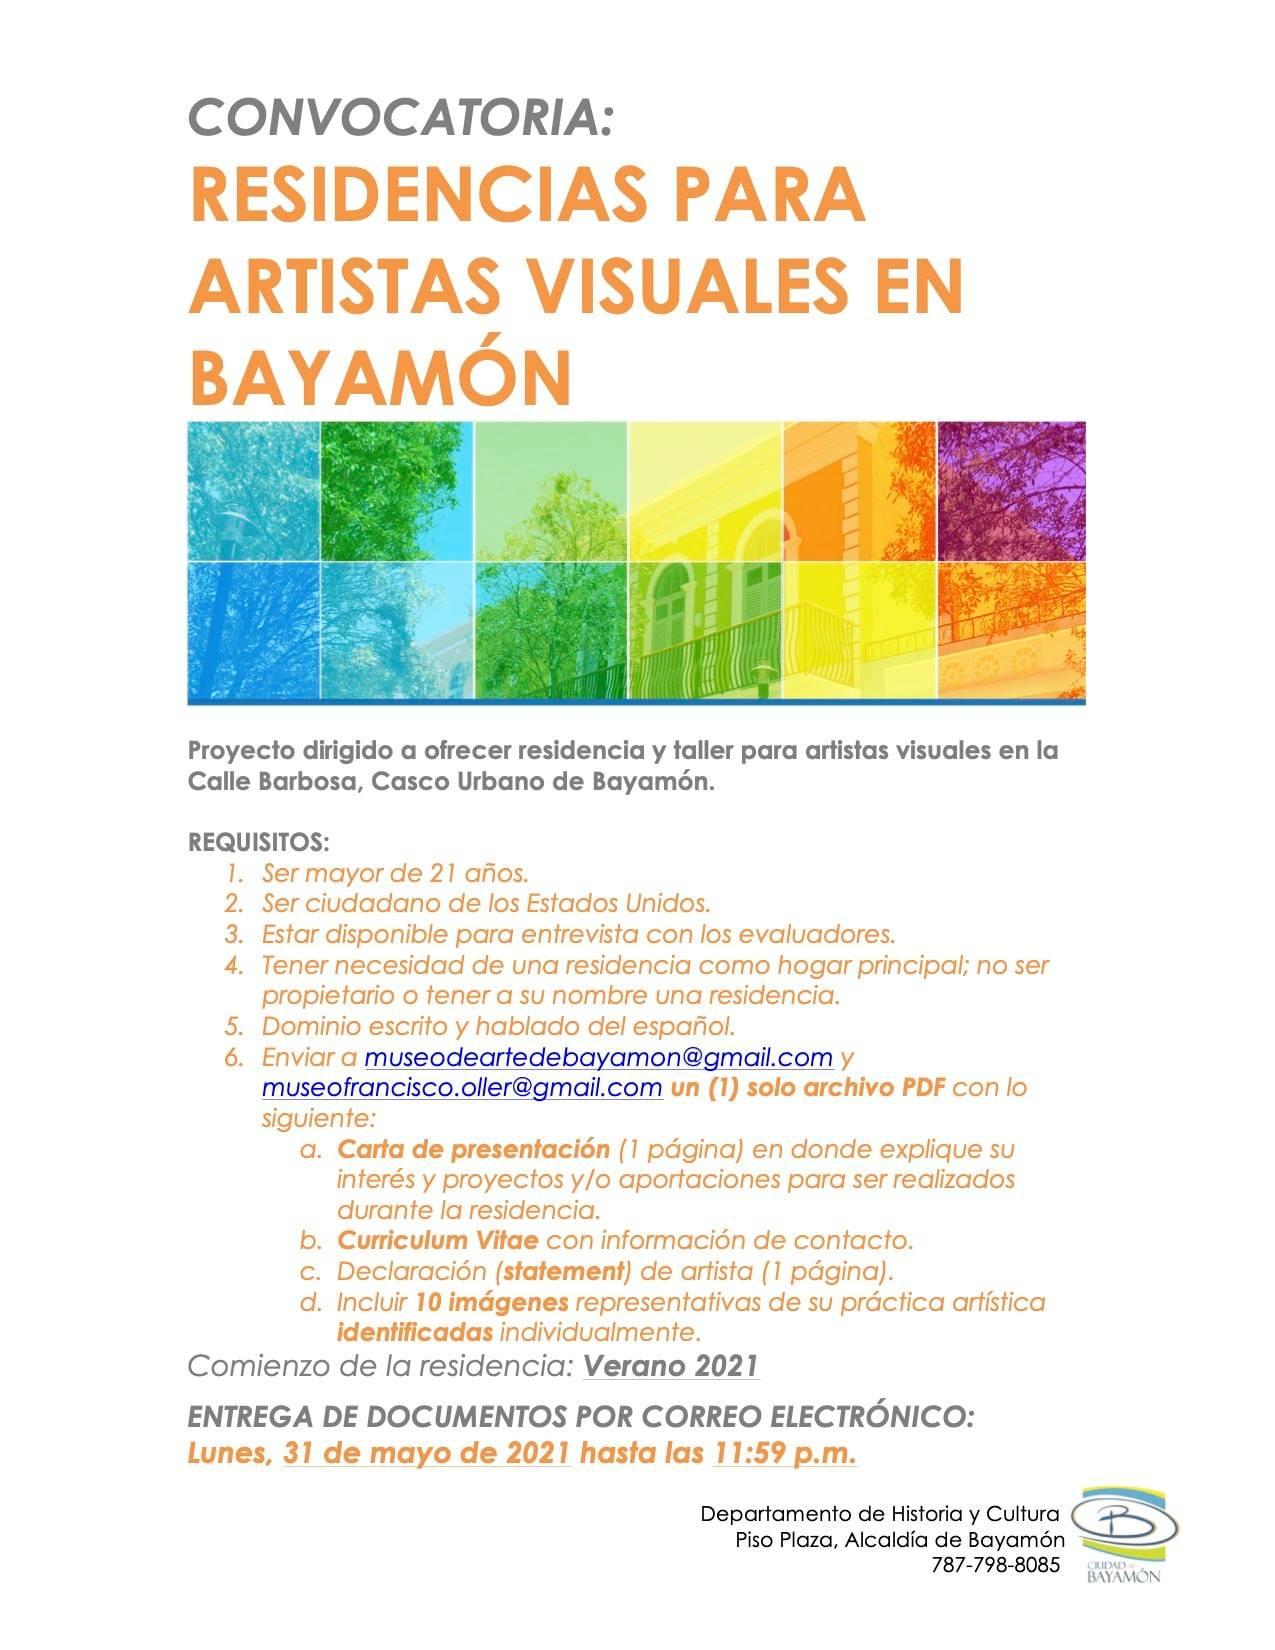 Convocatoria para Artistas Visuales en Bayamón